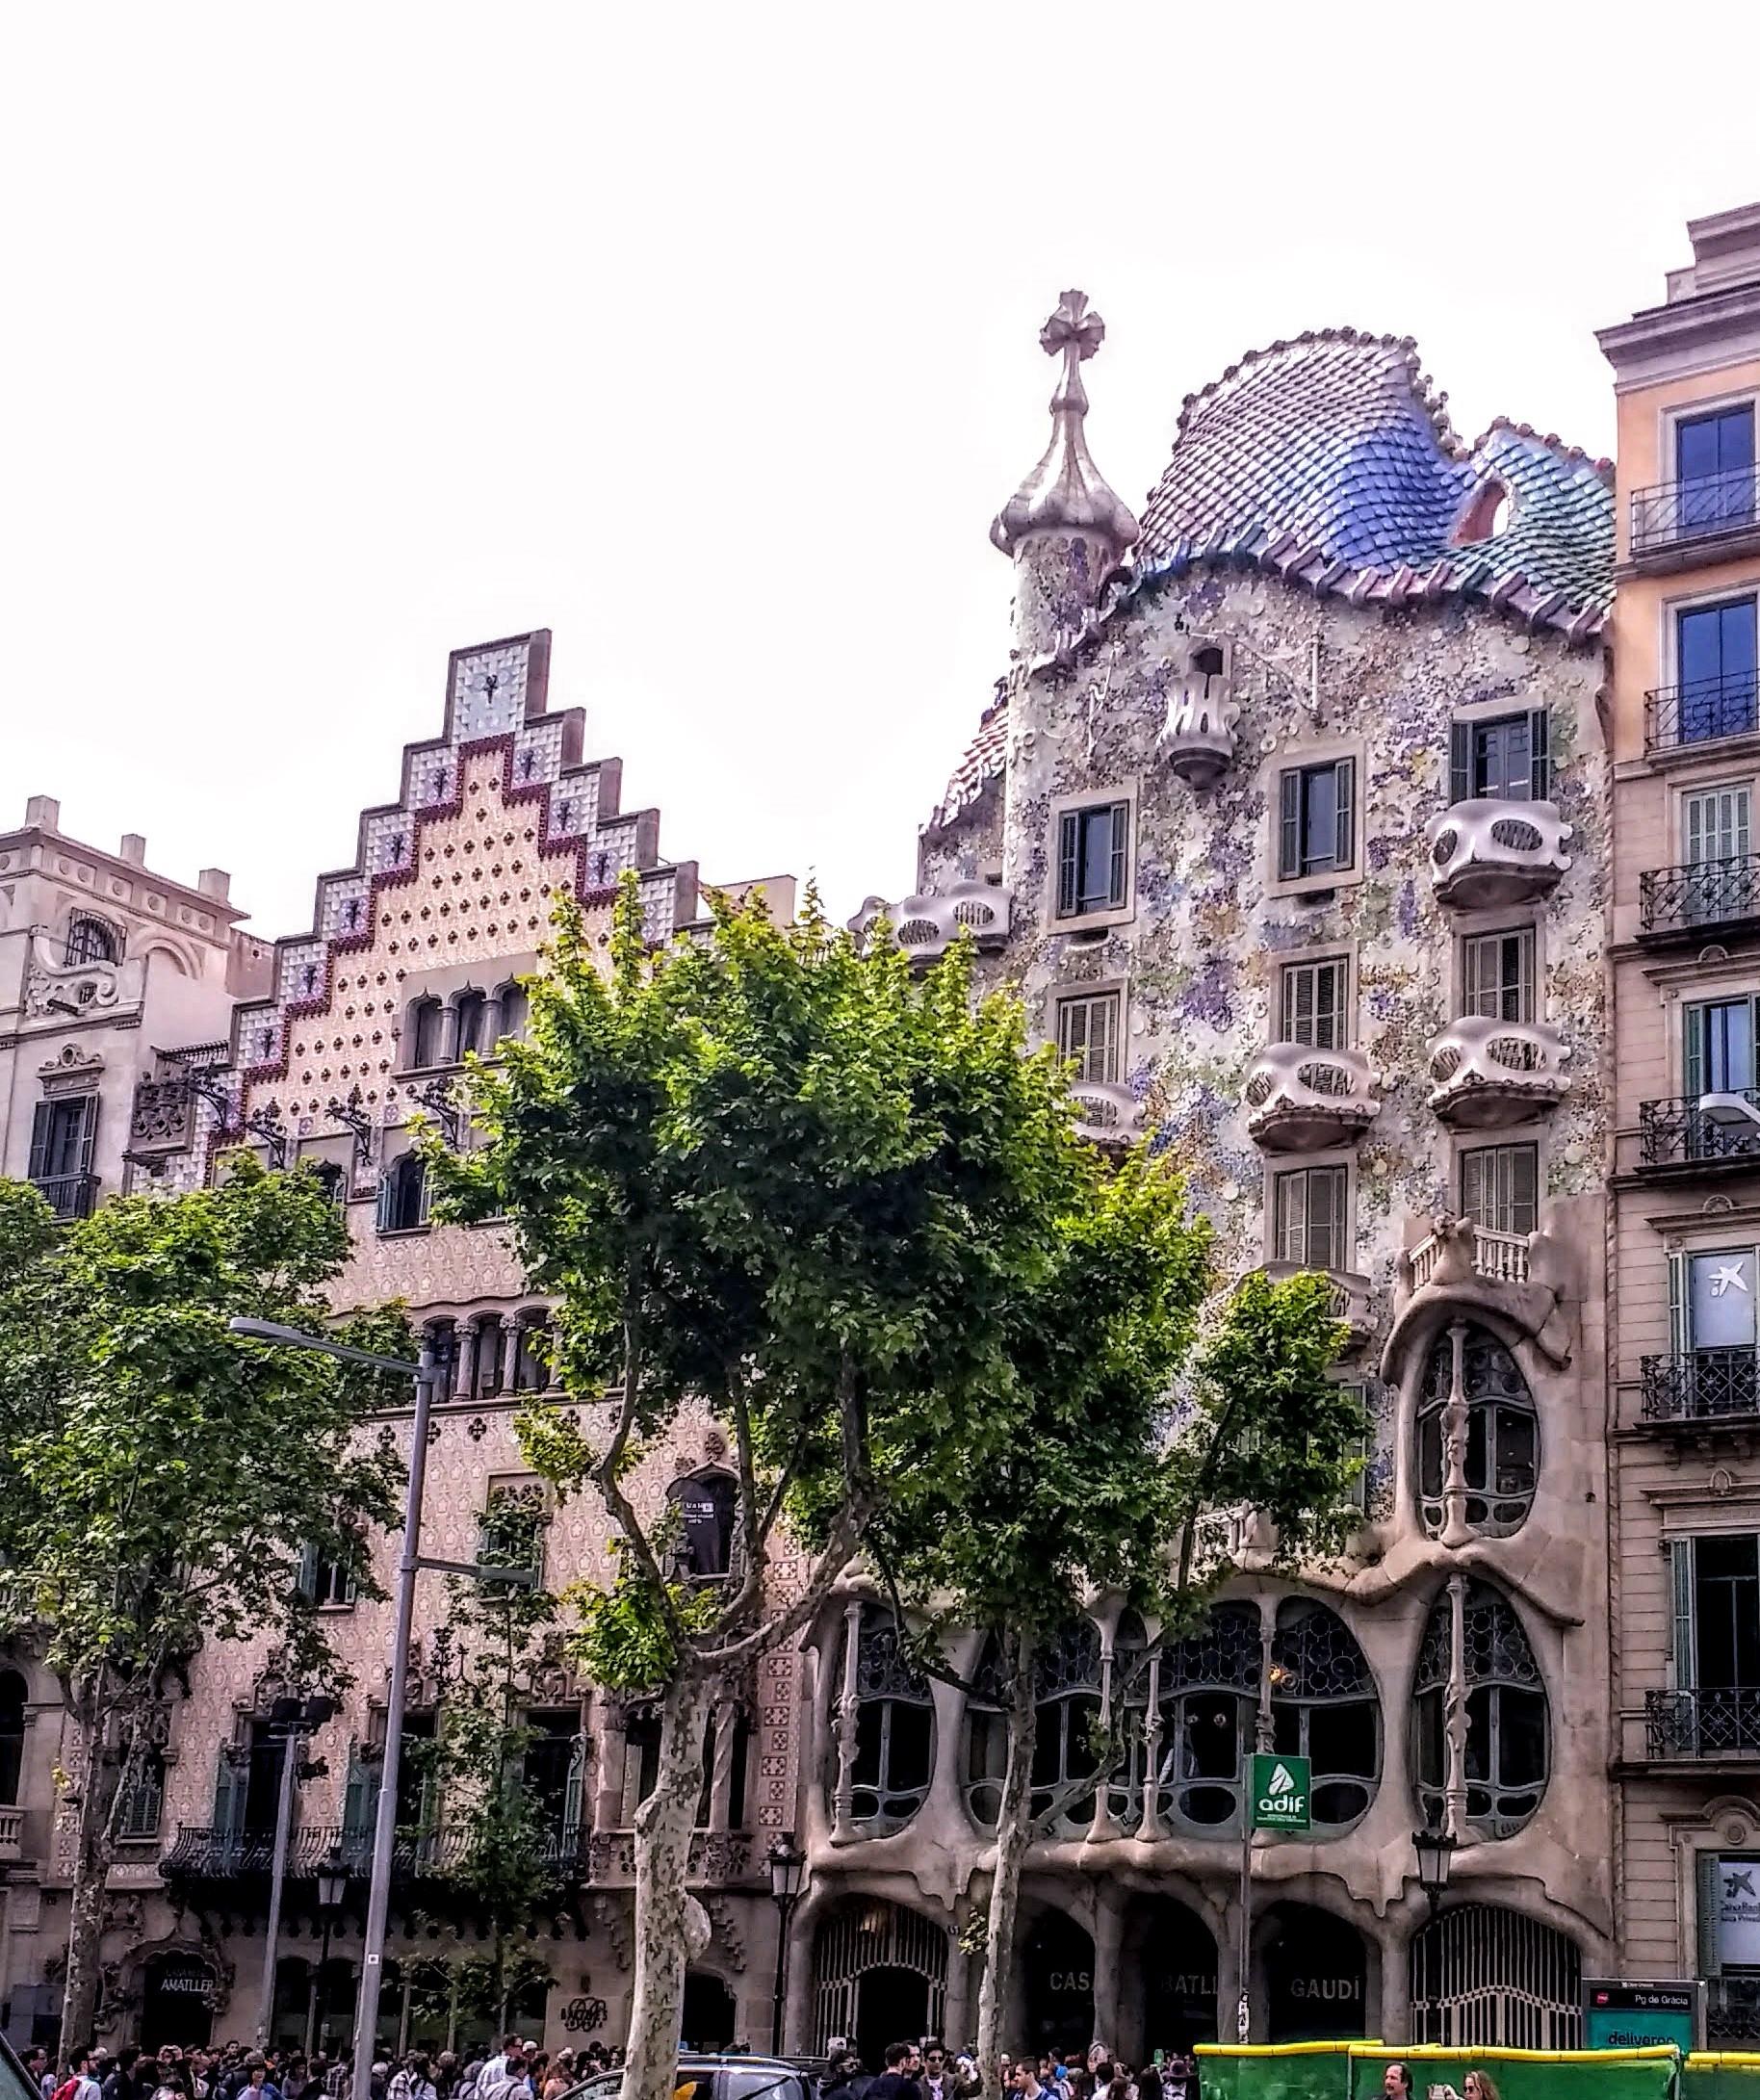 Gaudi-licious!